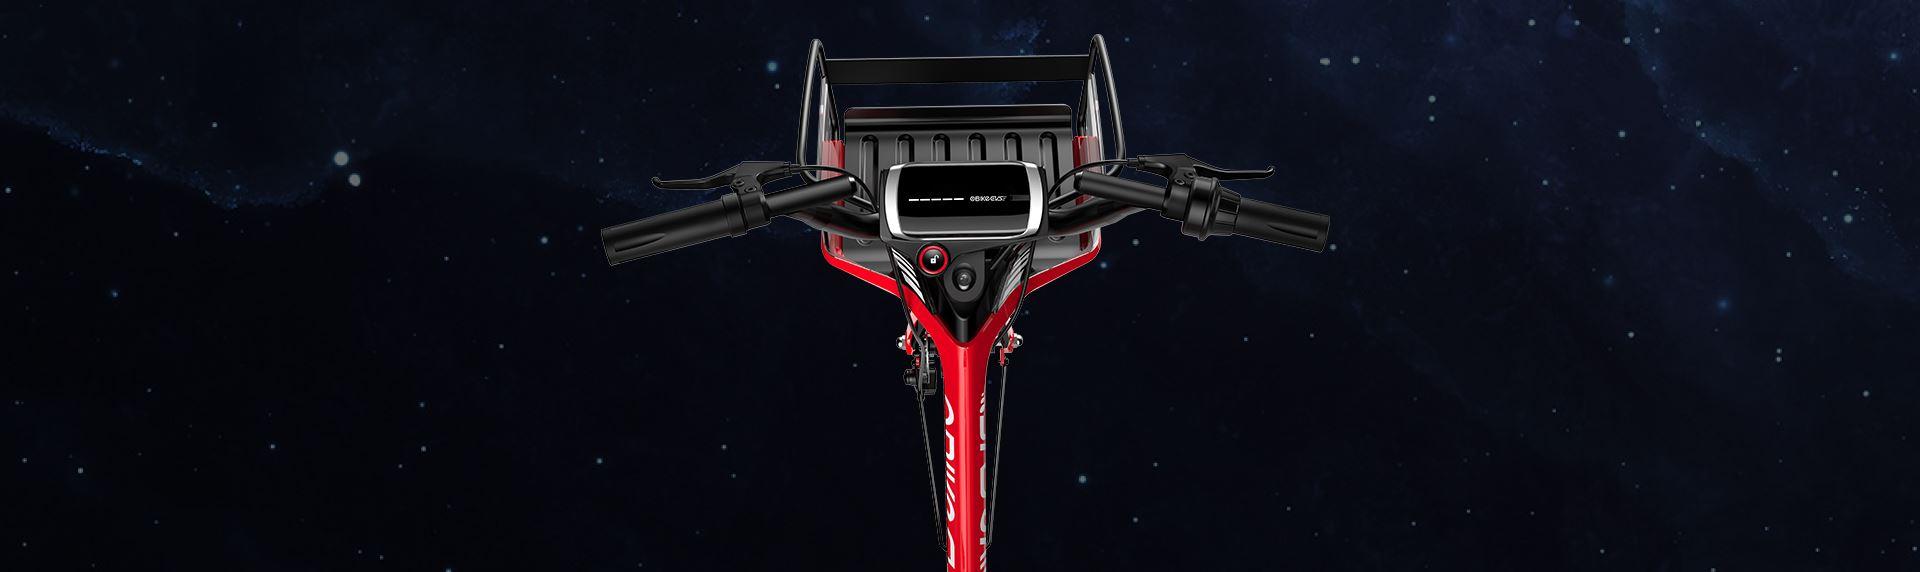 SSC设计-OBIKEEVS动力辅助自行车